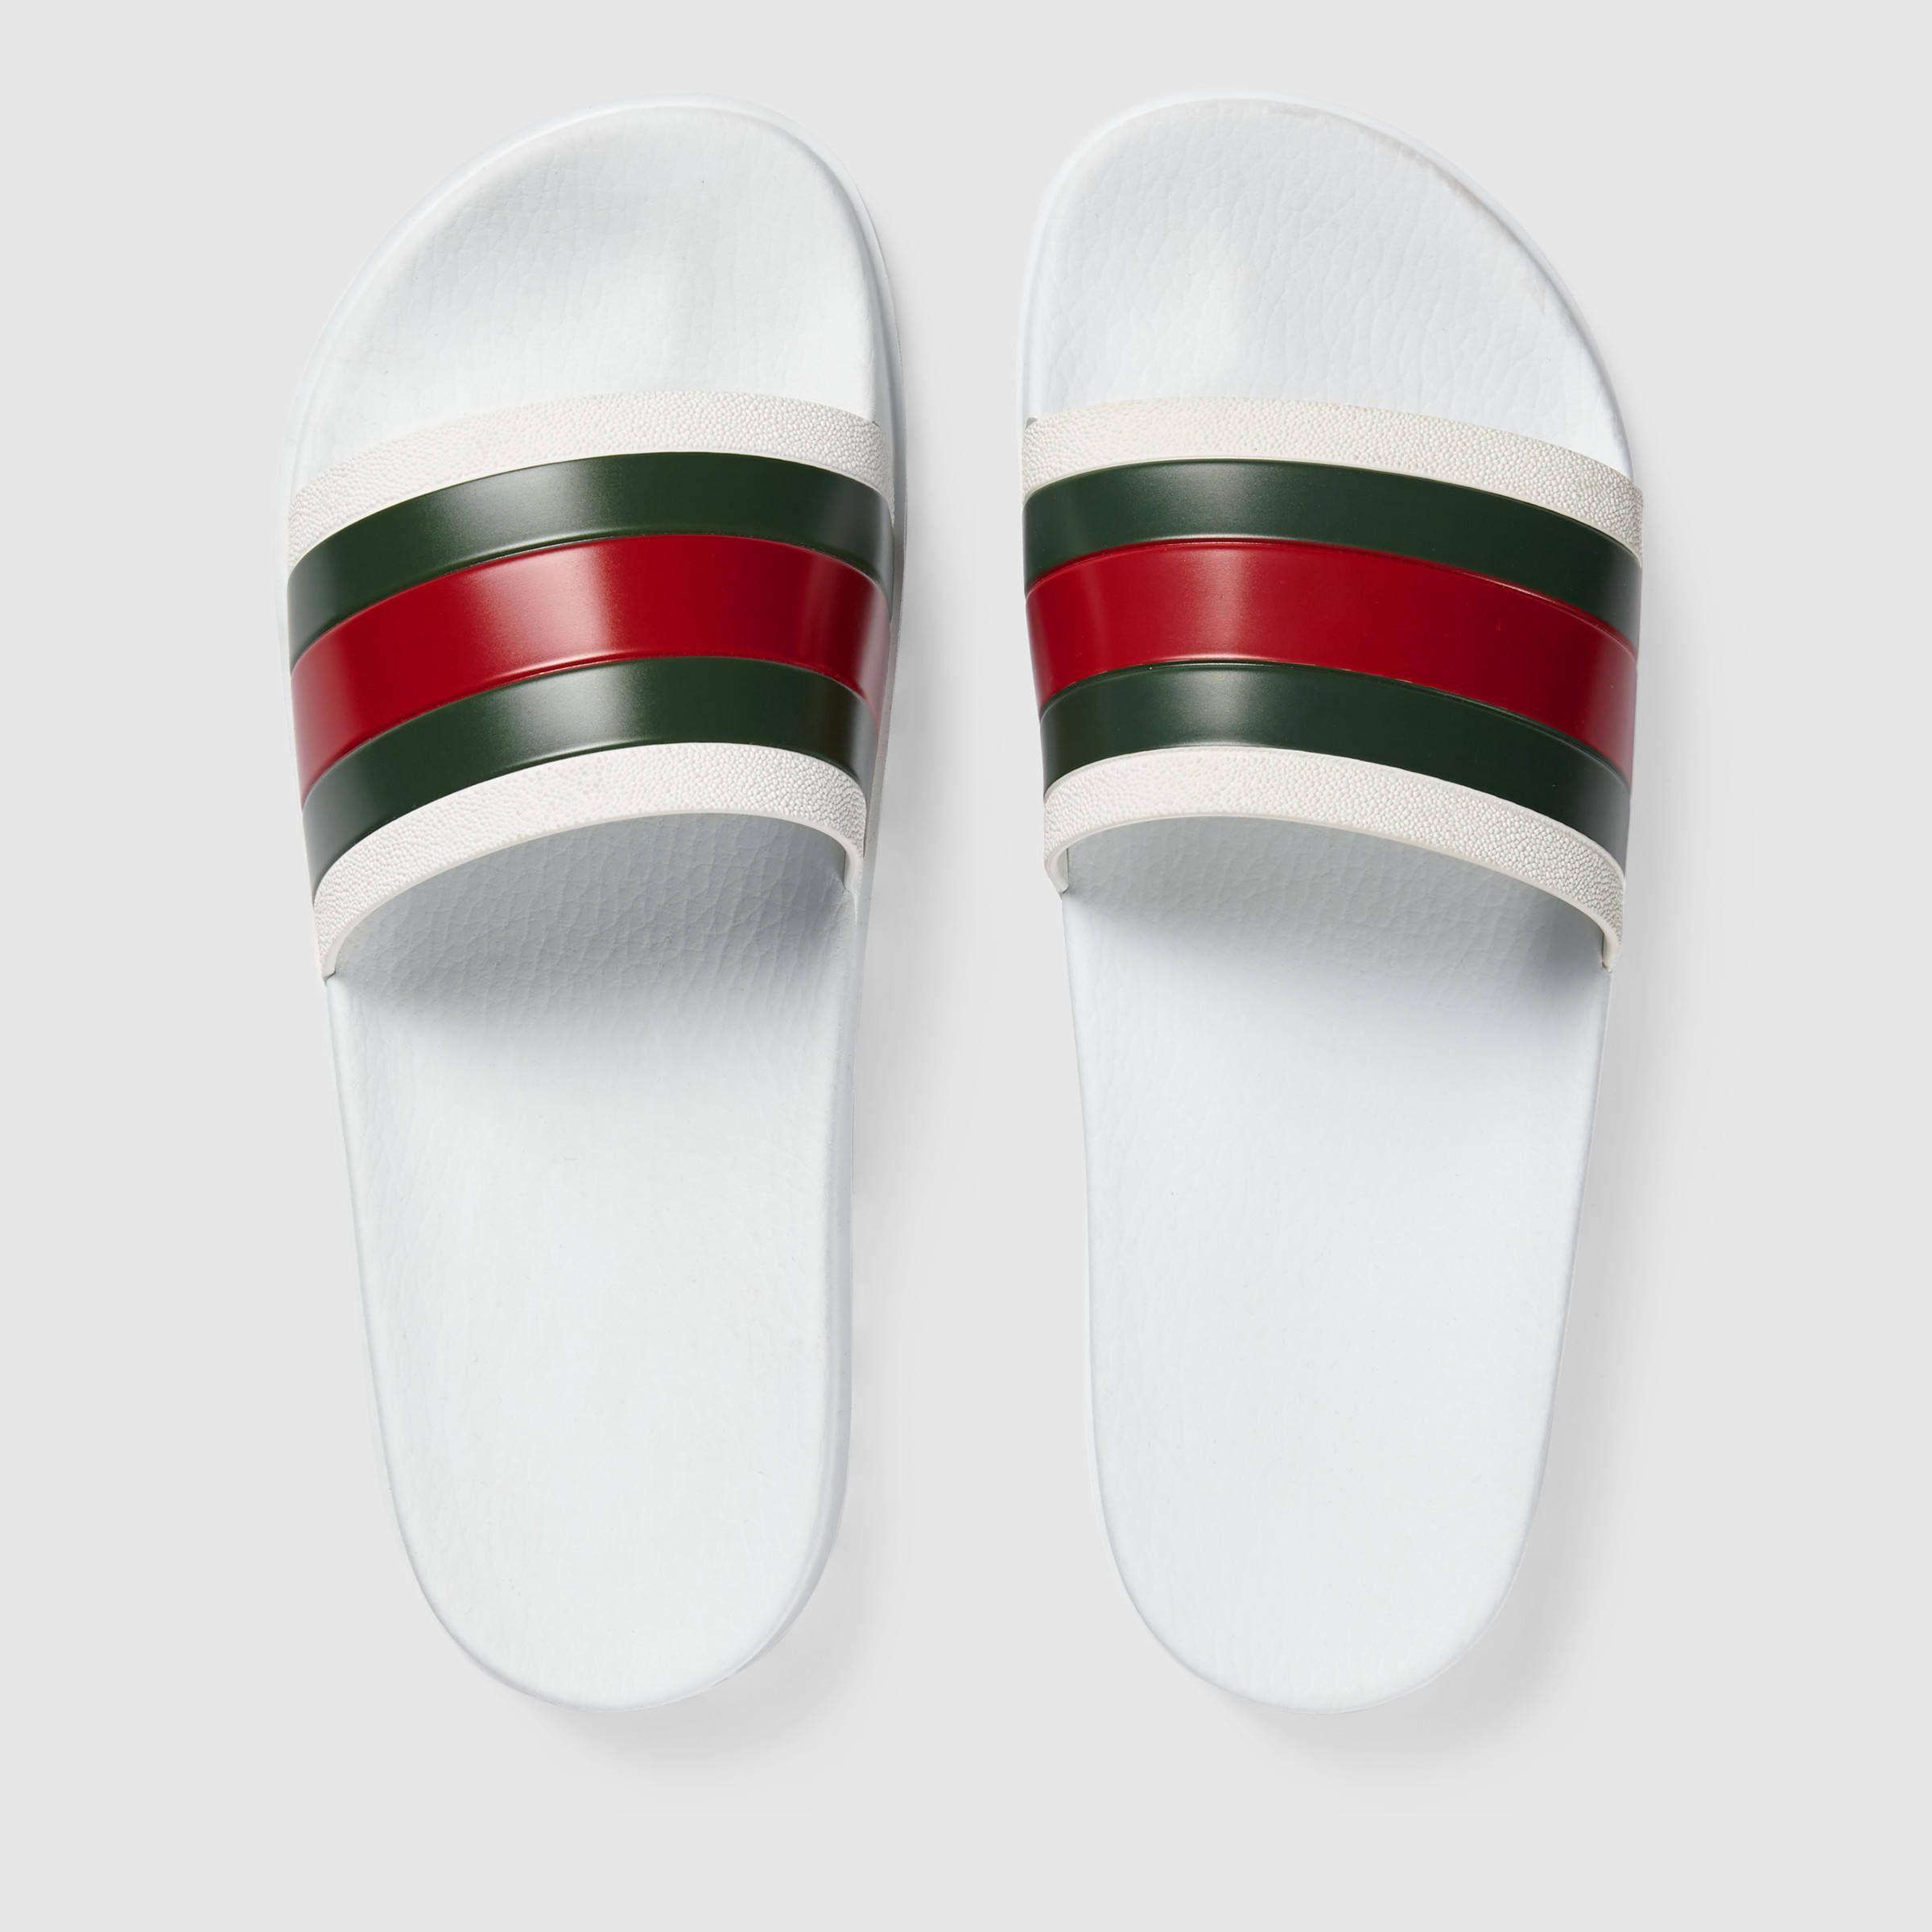 d93cc2faf5503d Gucci Men - Rubber slide sandal -  160